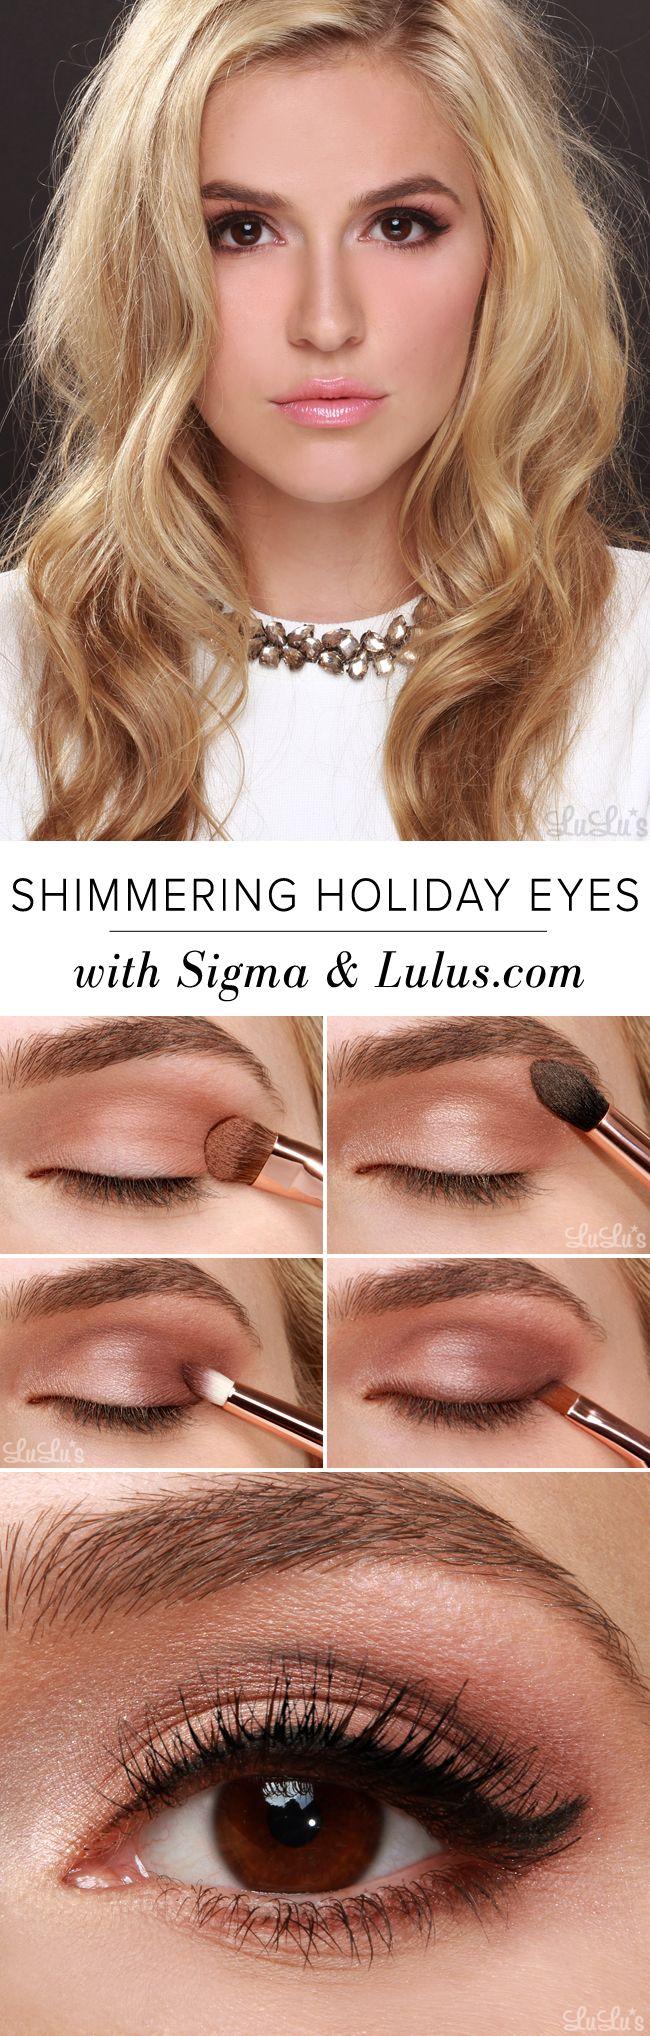 Shimmering Holiday Eyes